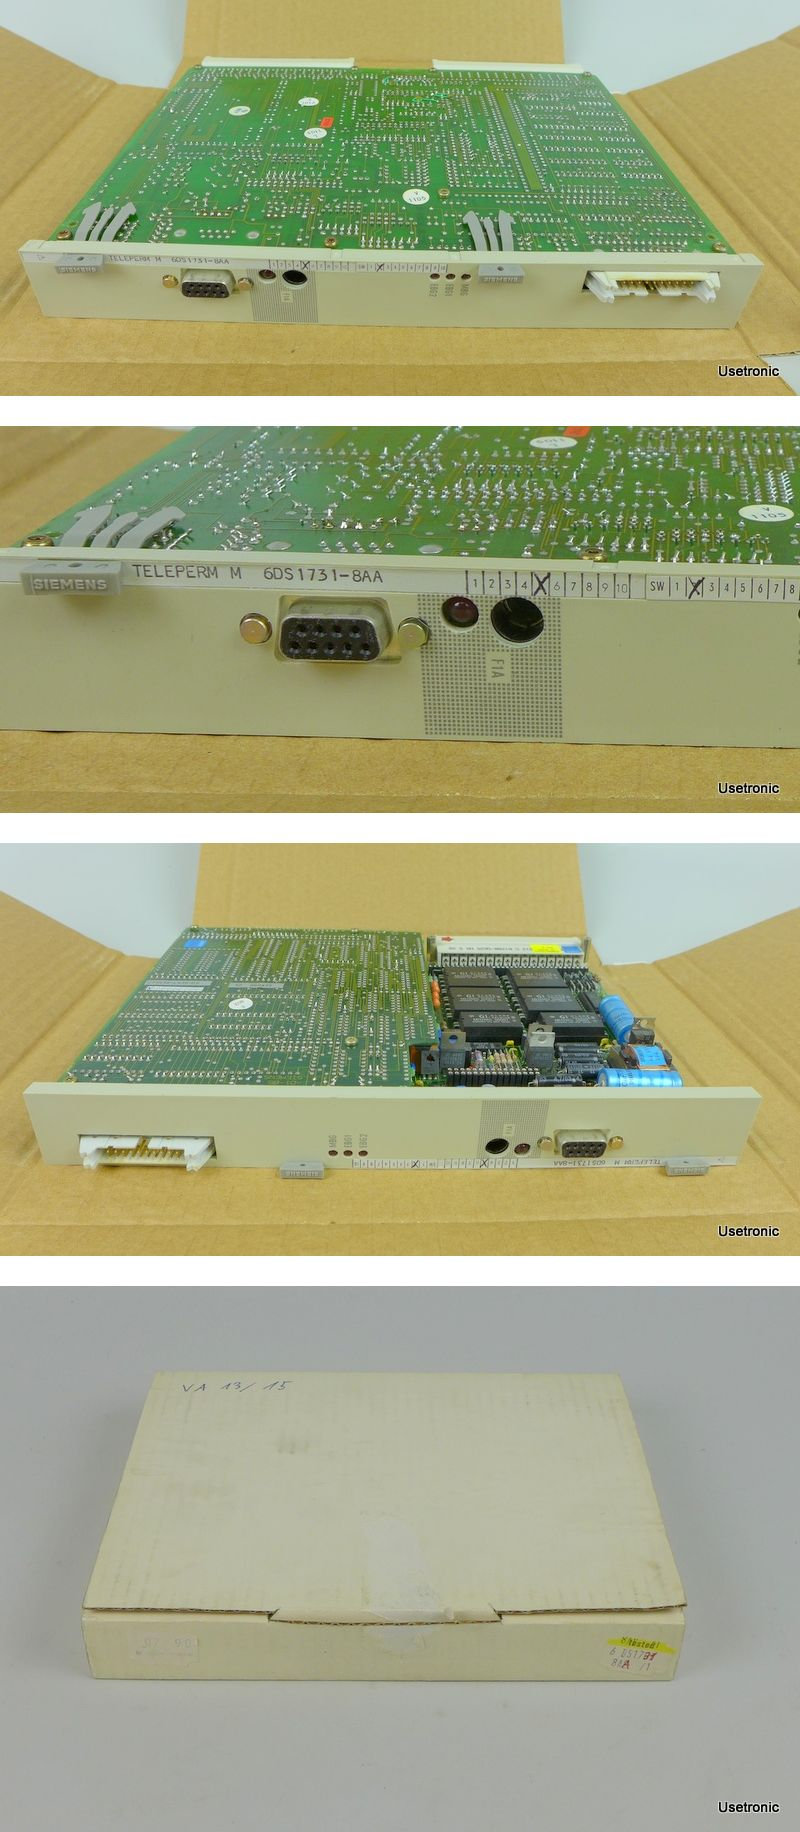 Siemens Teleperm M 6DS1731-8AA 6DS1 731-8AA